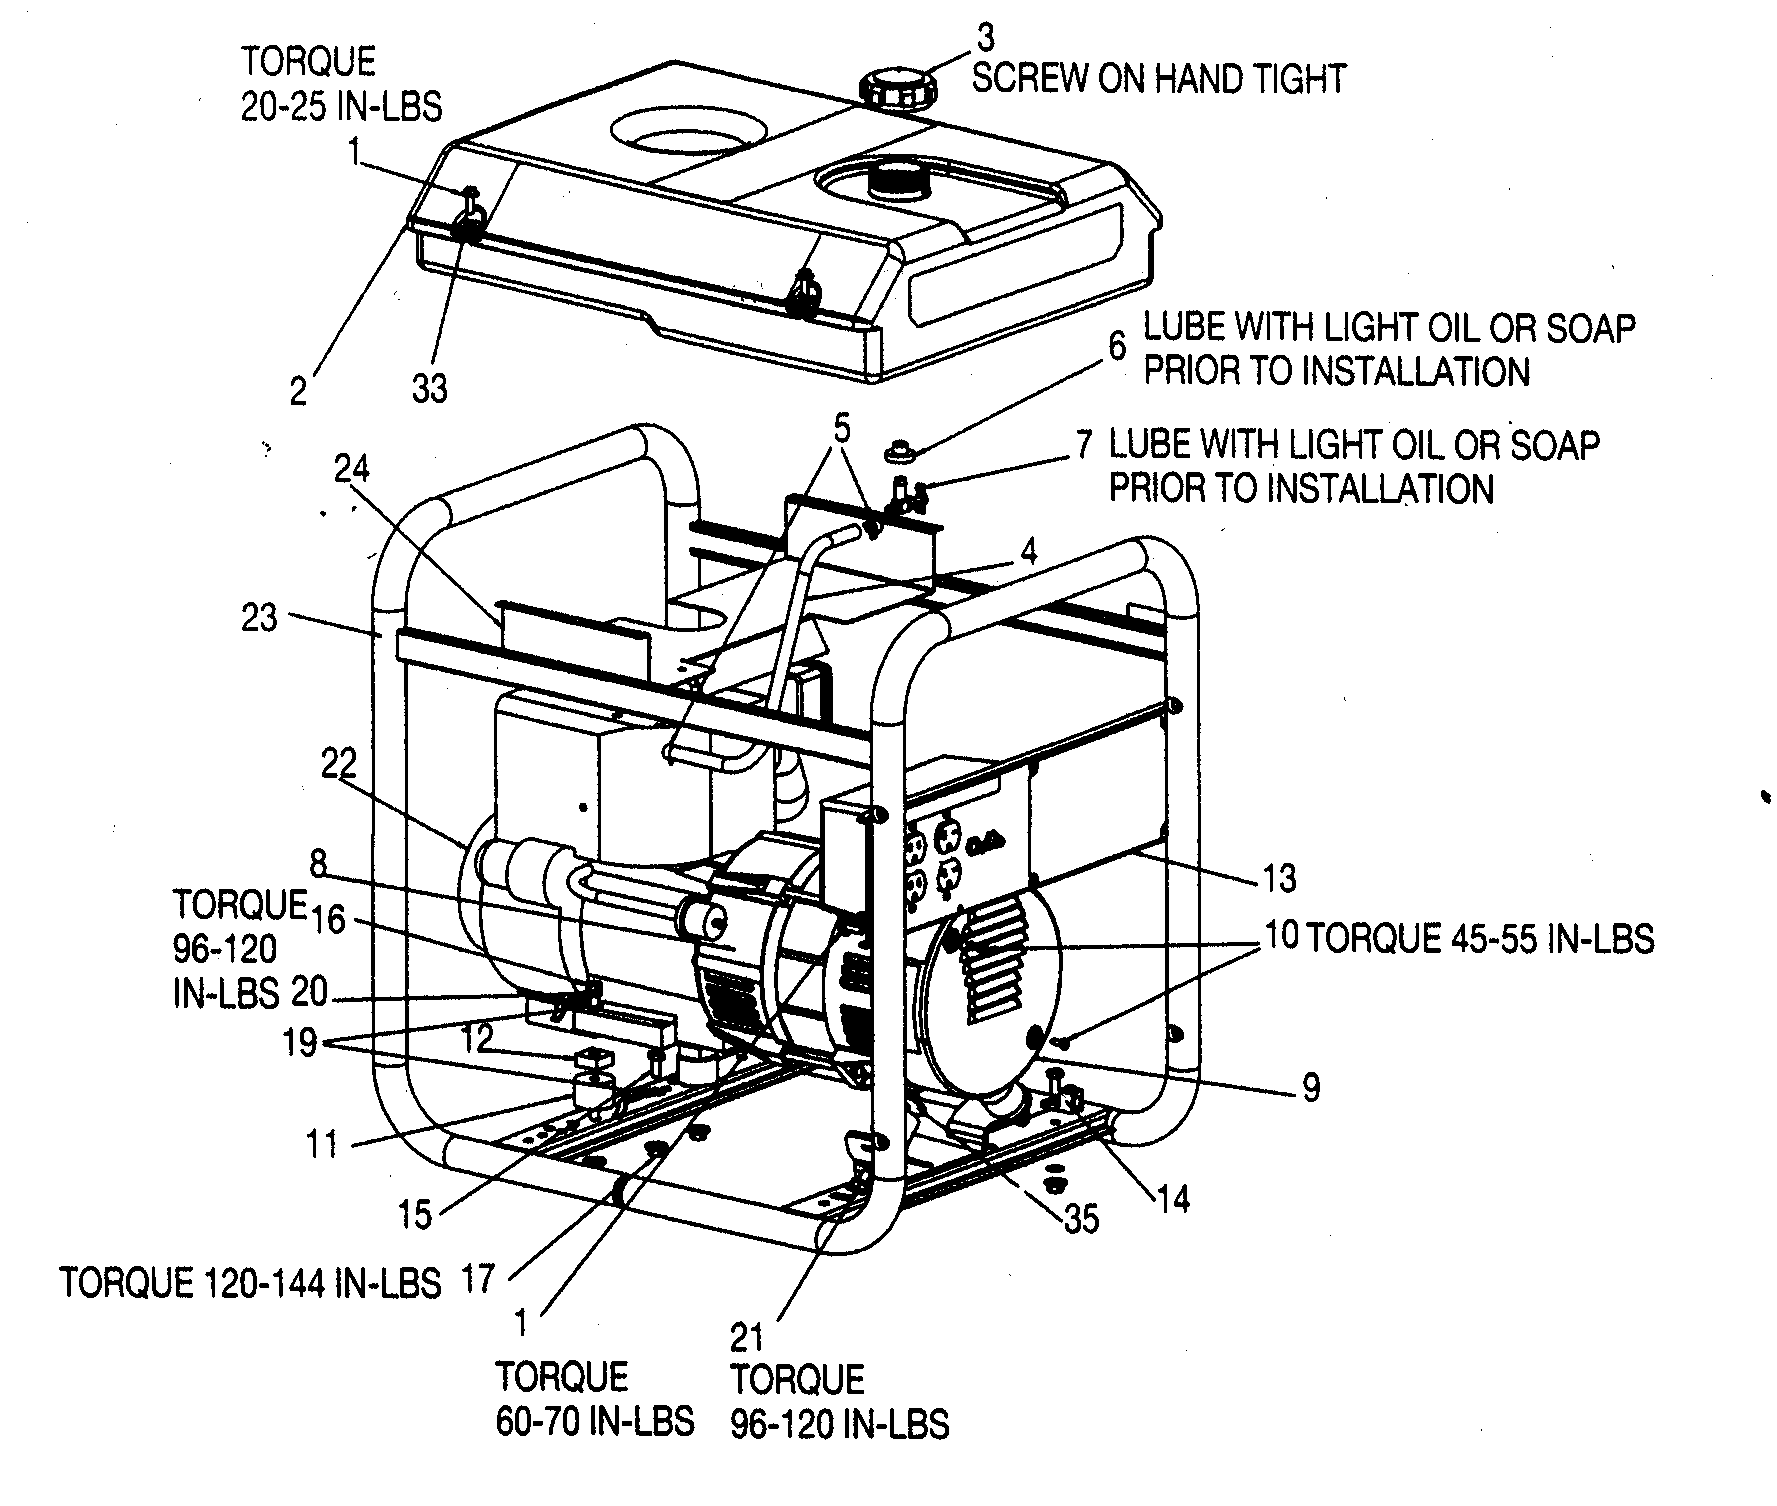 devilbiss model 306ds user manual